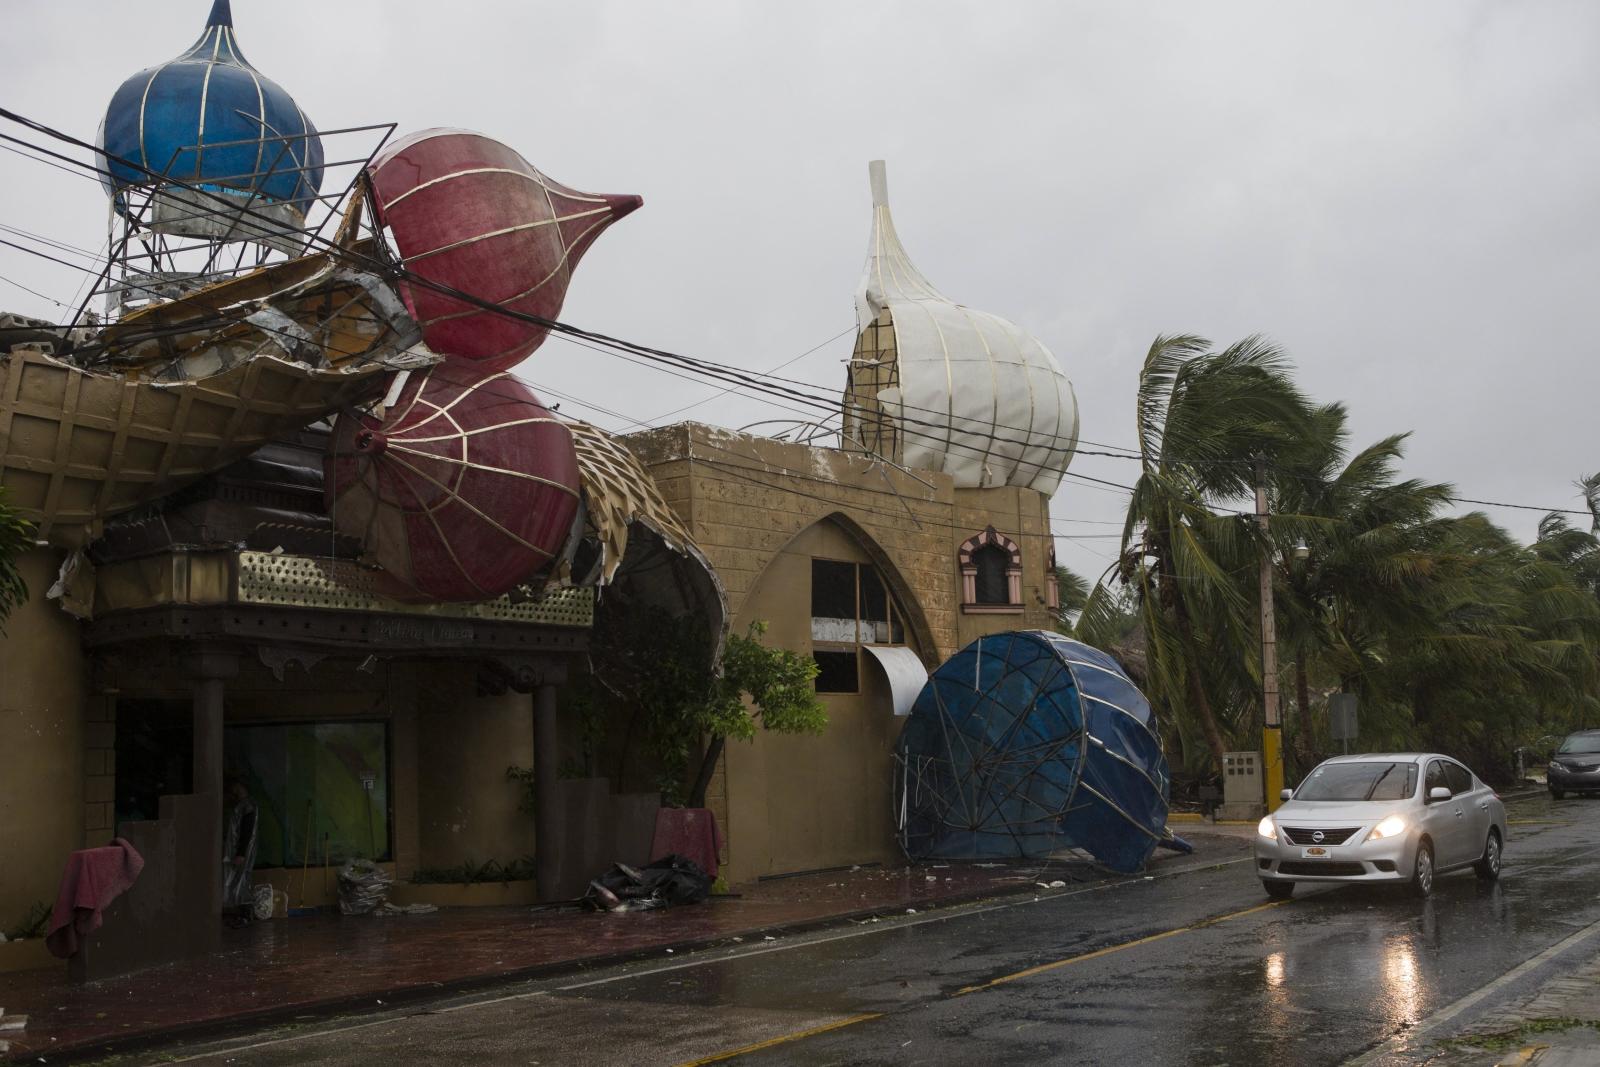 Huragan Maria w Punta Cana, Dominikana